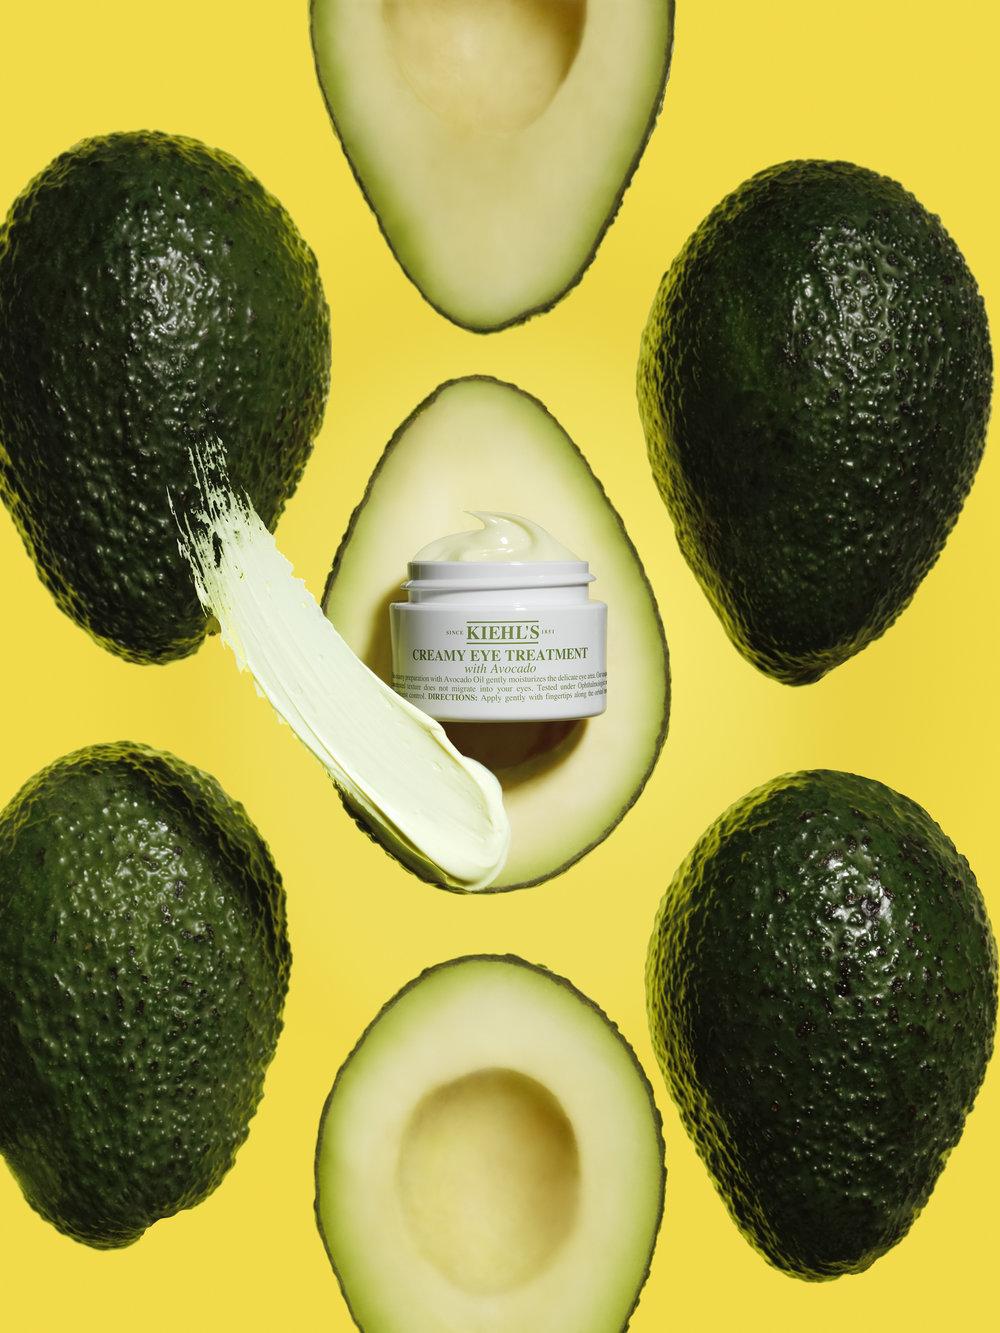 3030-1_06_RP_Kiehls_+++avocado_detail_010_R1_5.jpg